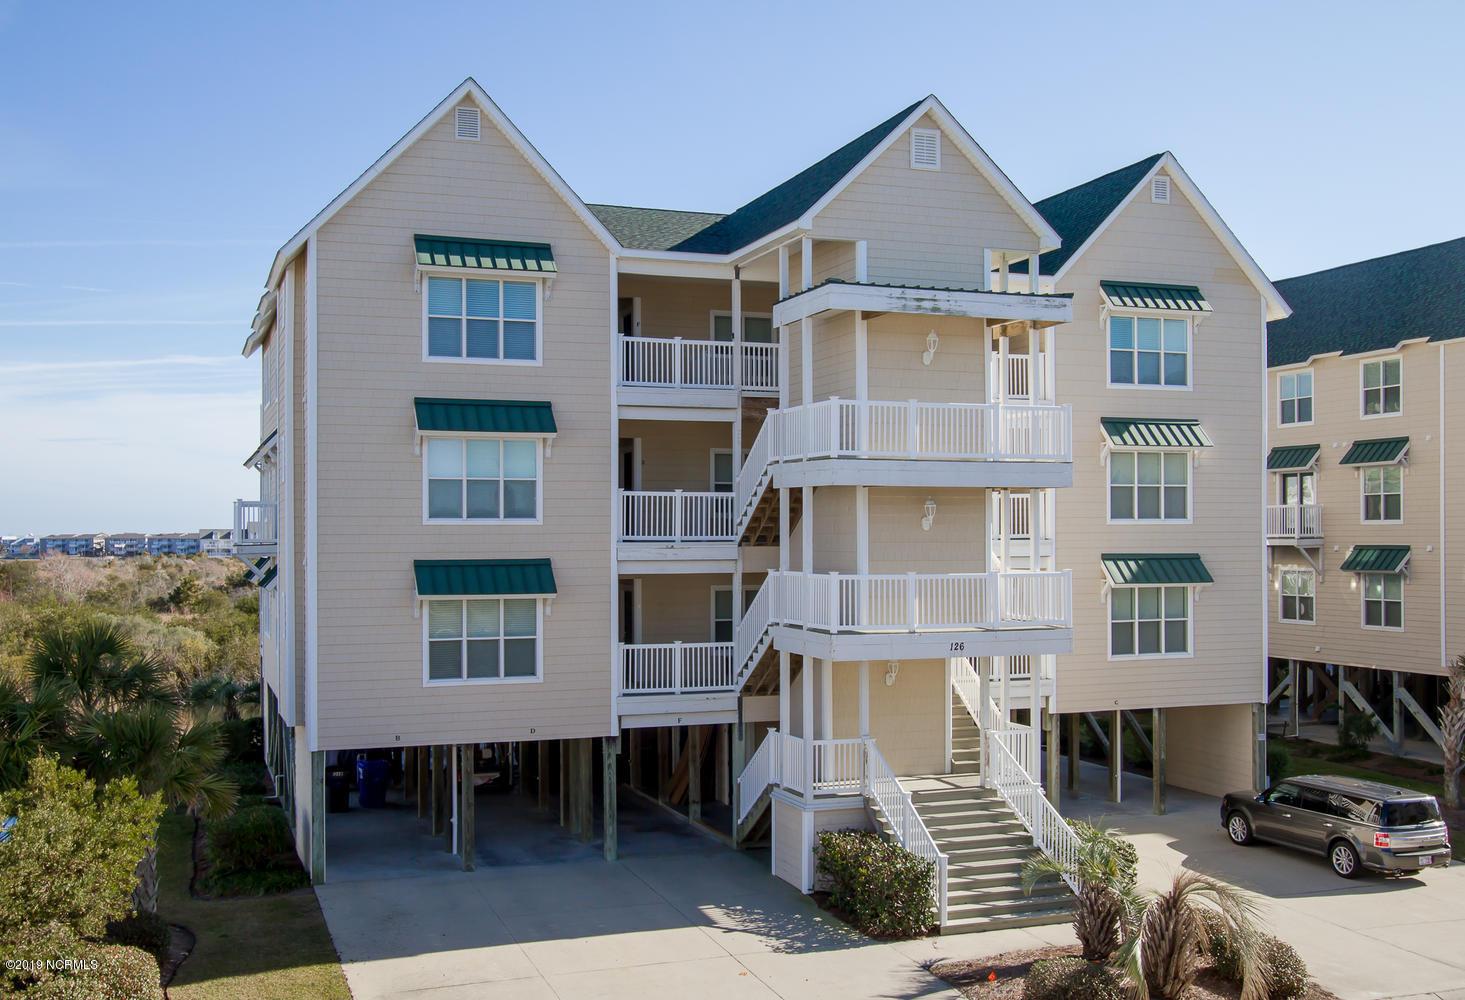 Carolina Plantations Real Estate - MLS Number: 100145465